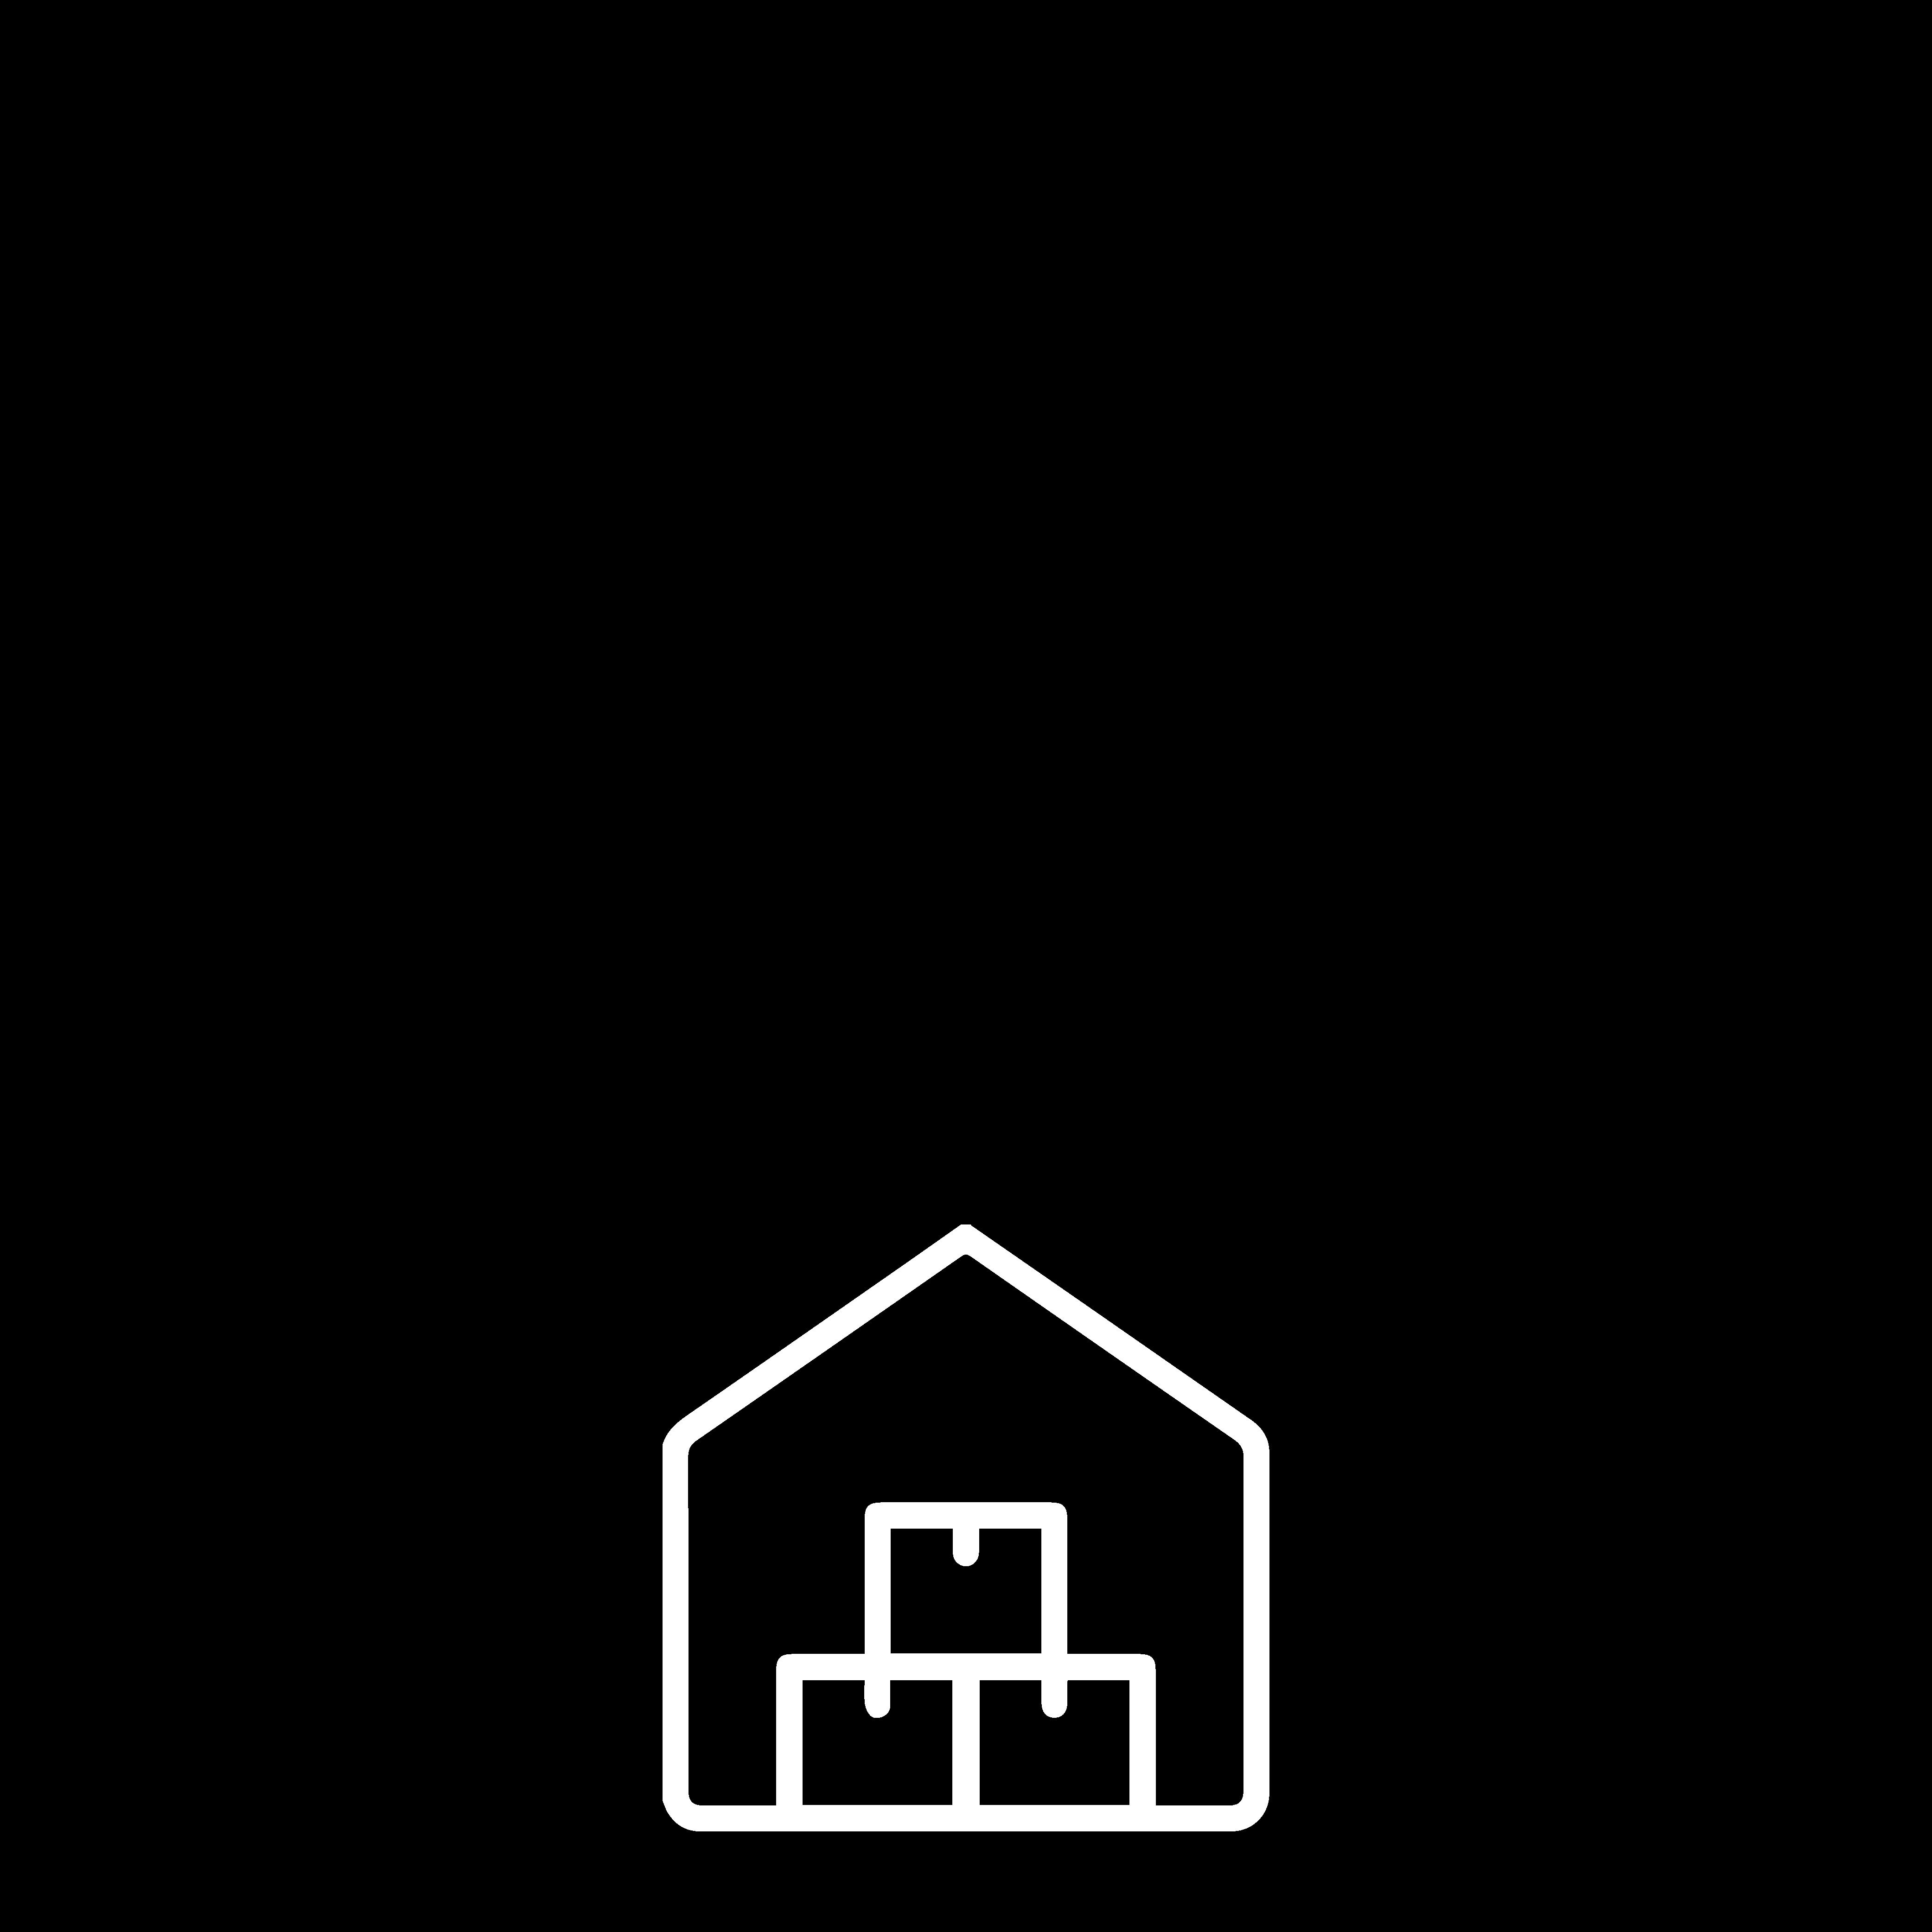 nordexladu-01-01